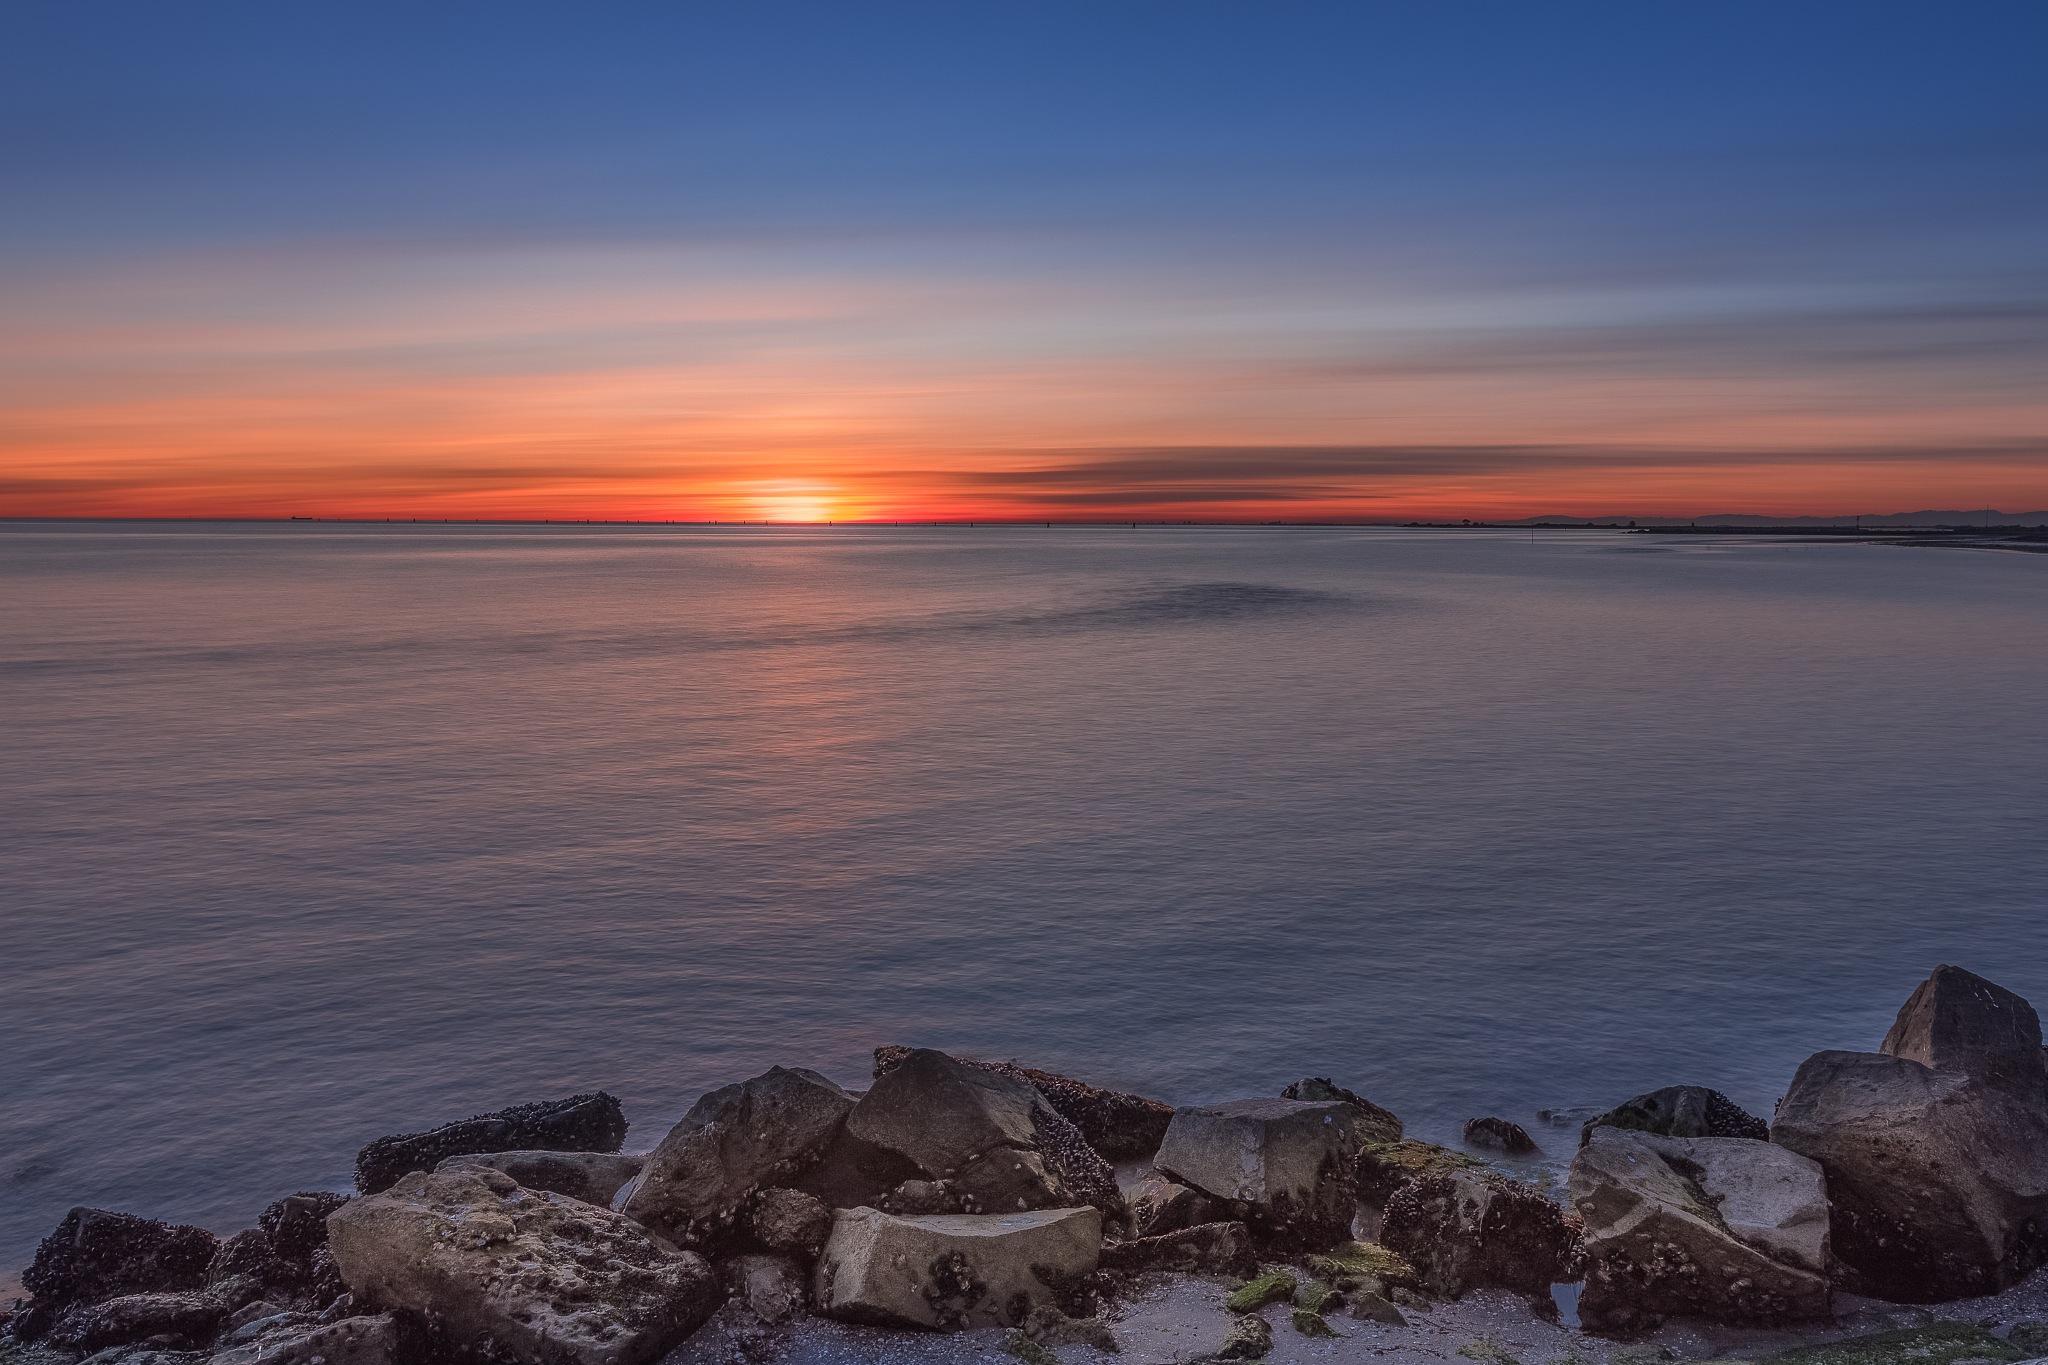 Sunset over Grado by Massimo Buccolieri